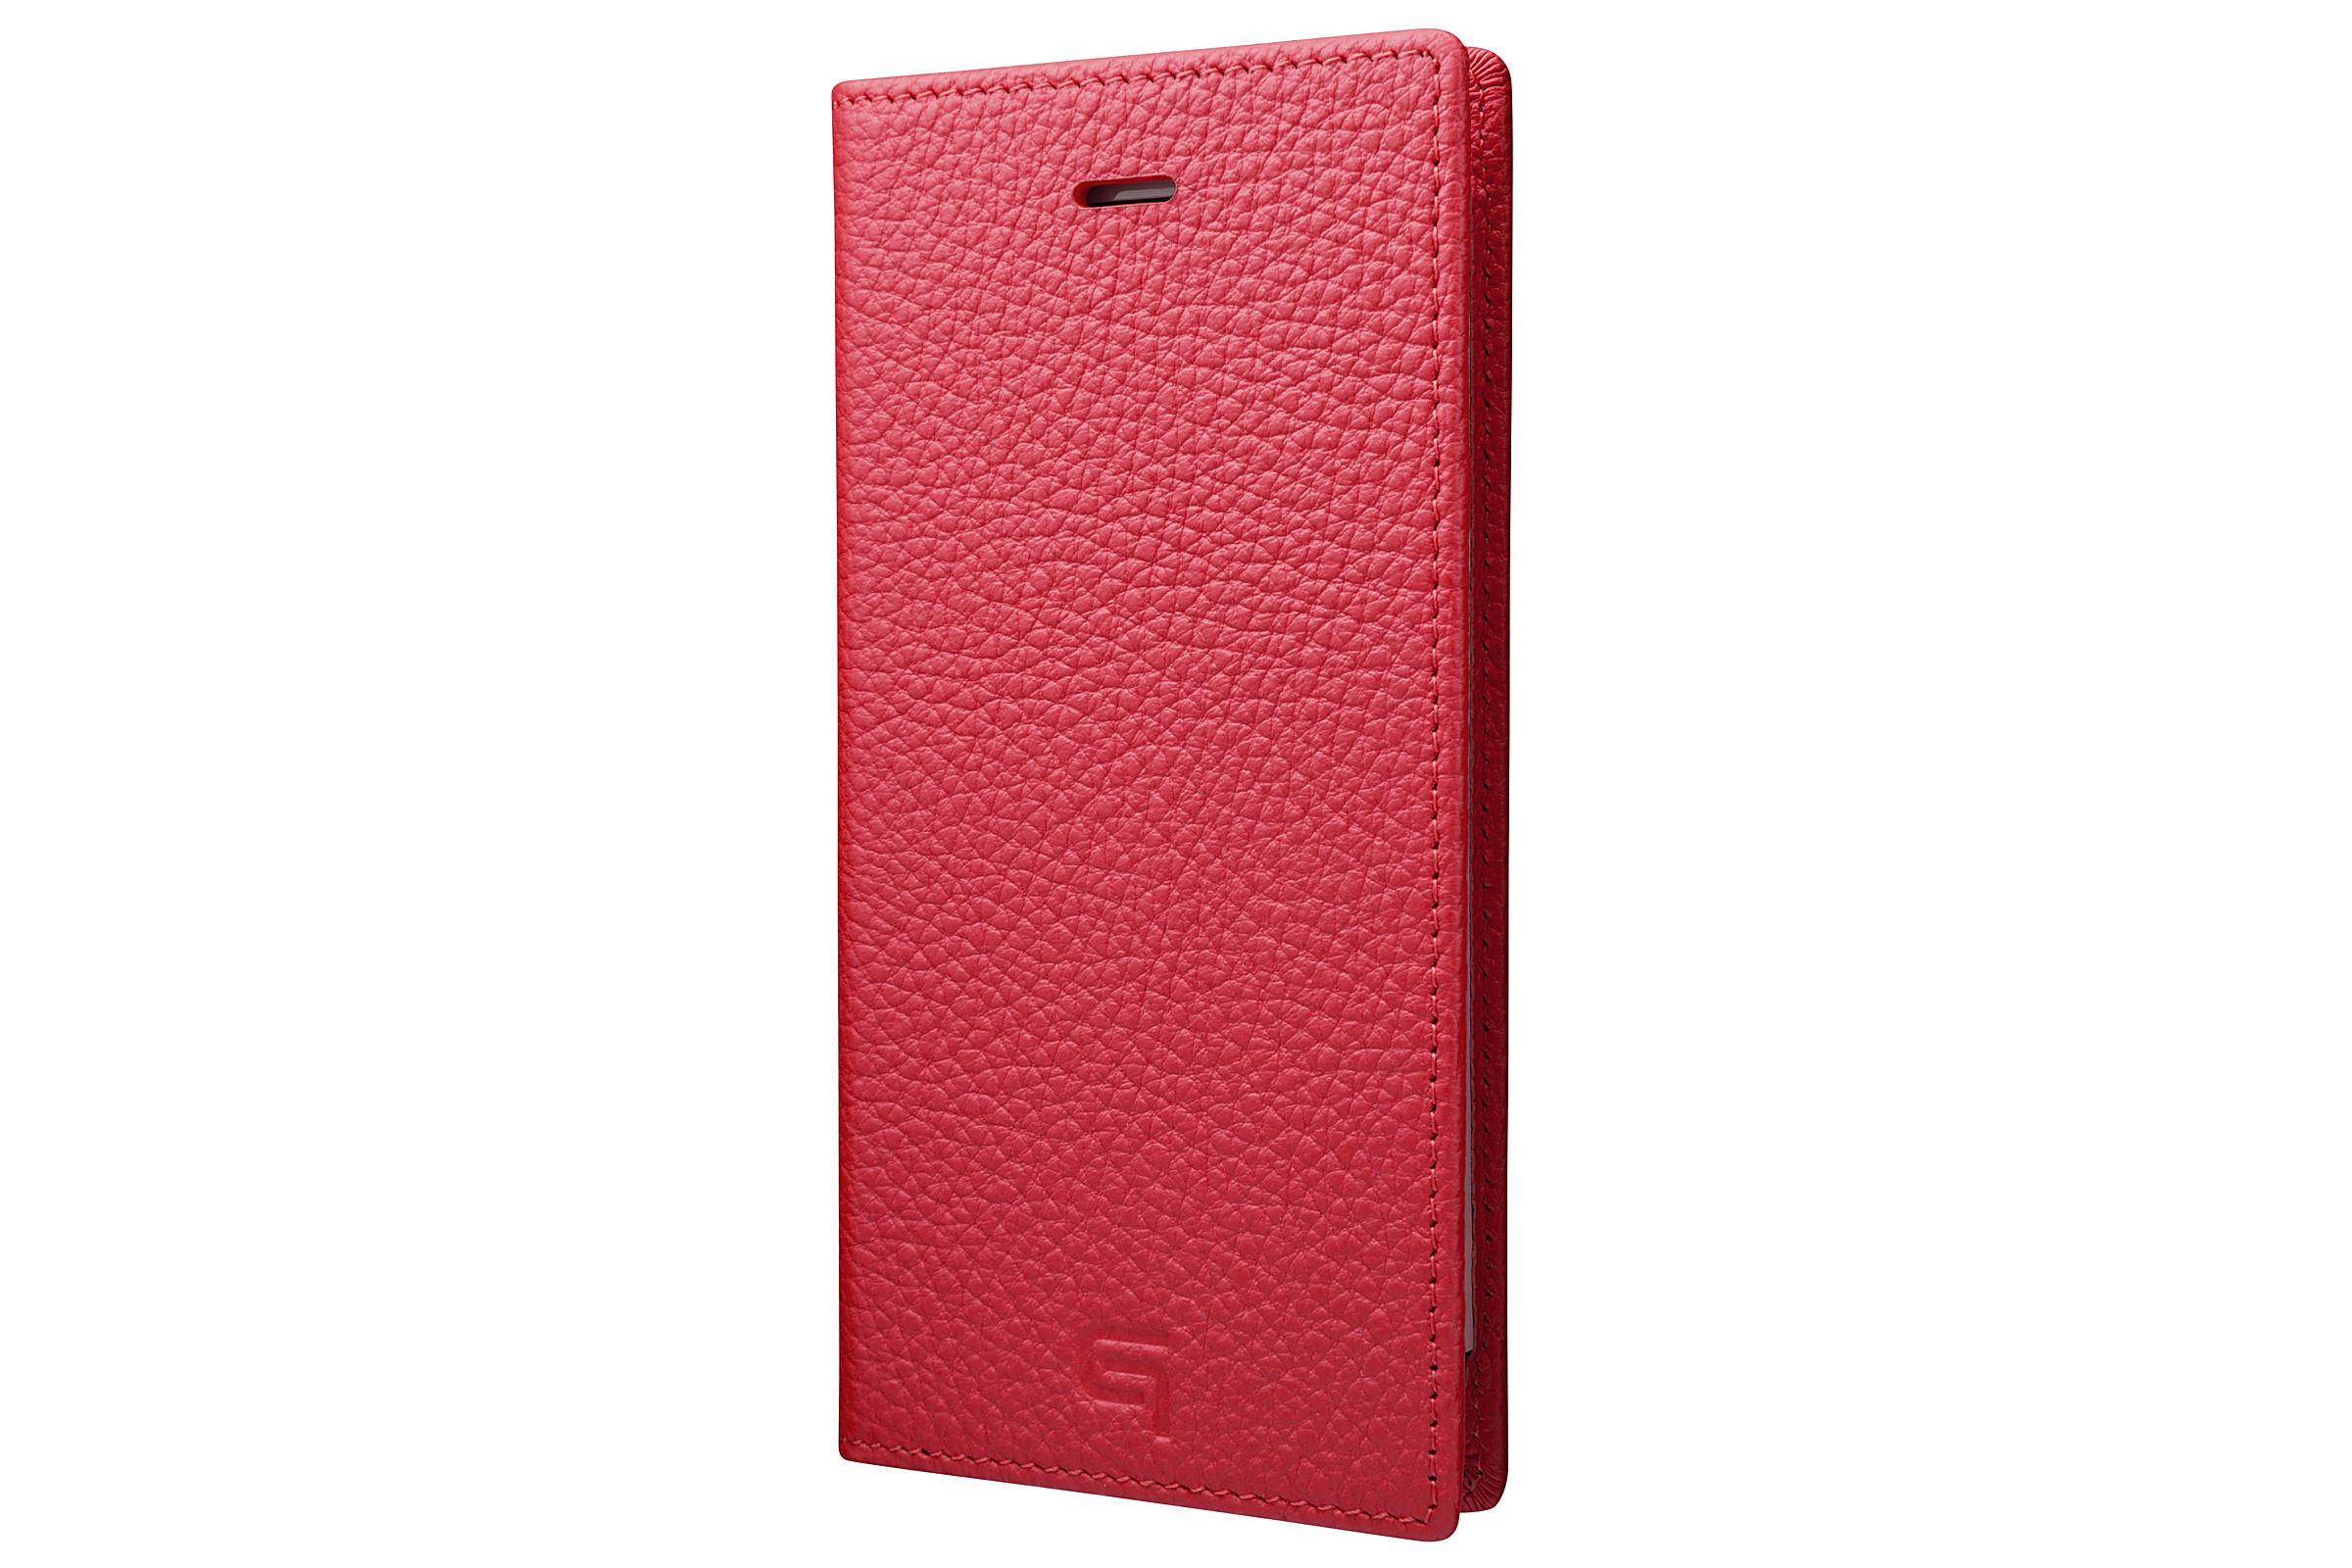 GRAMAS Shrunken-calf Full Leather Case for iPhone 7(Pink) シュランケンカーフ 手帳型フルレザーケース - 画像1